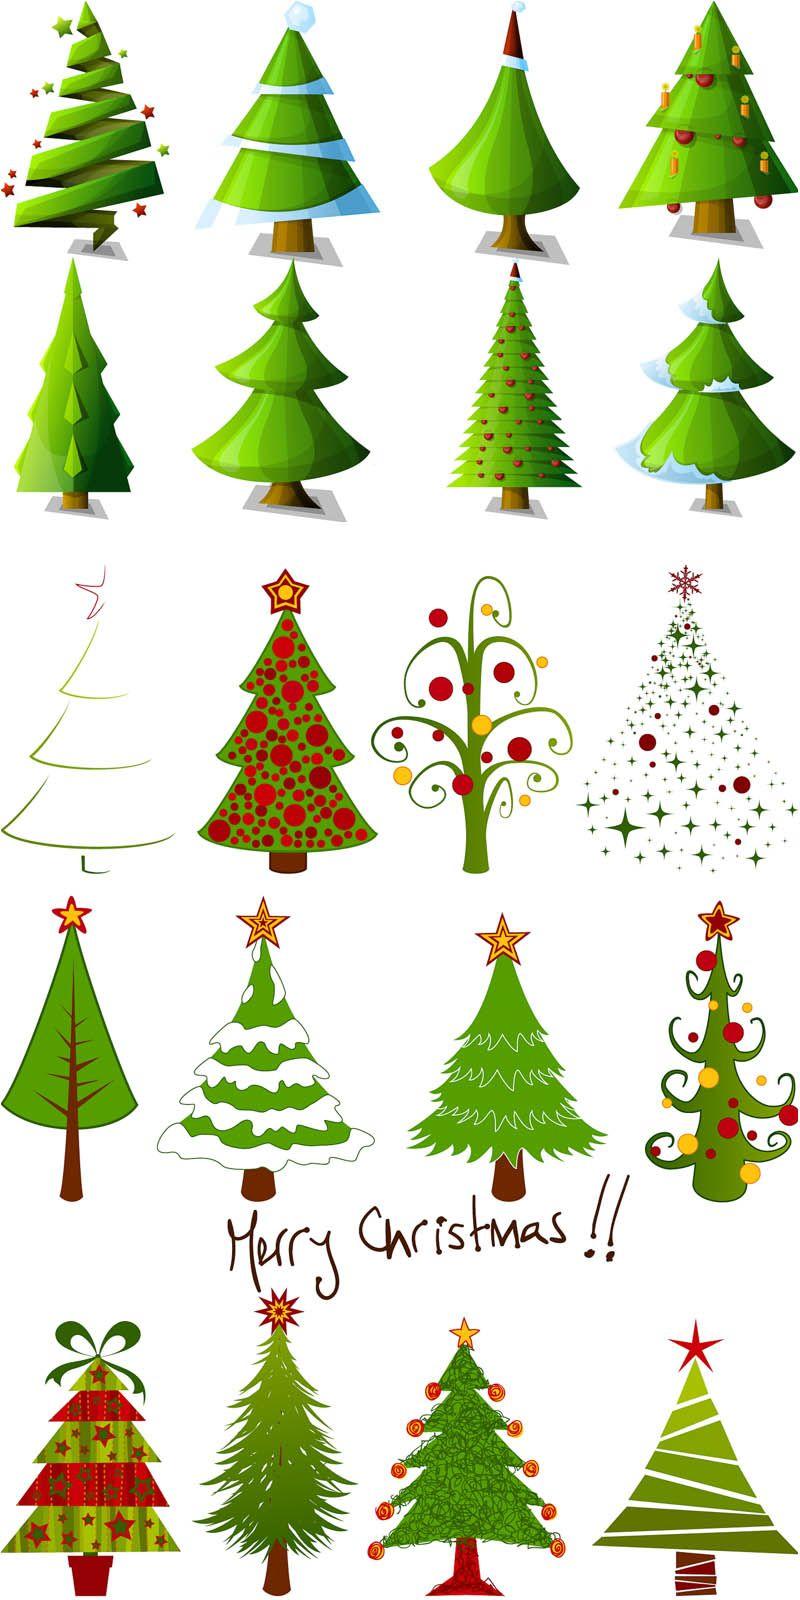 Cartoon Christmas Tree Designs Vector Cartoon Christmas Tree